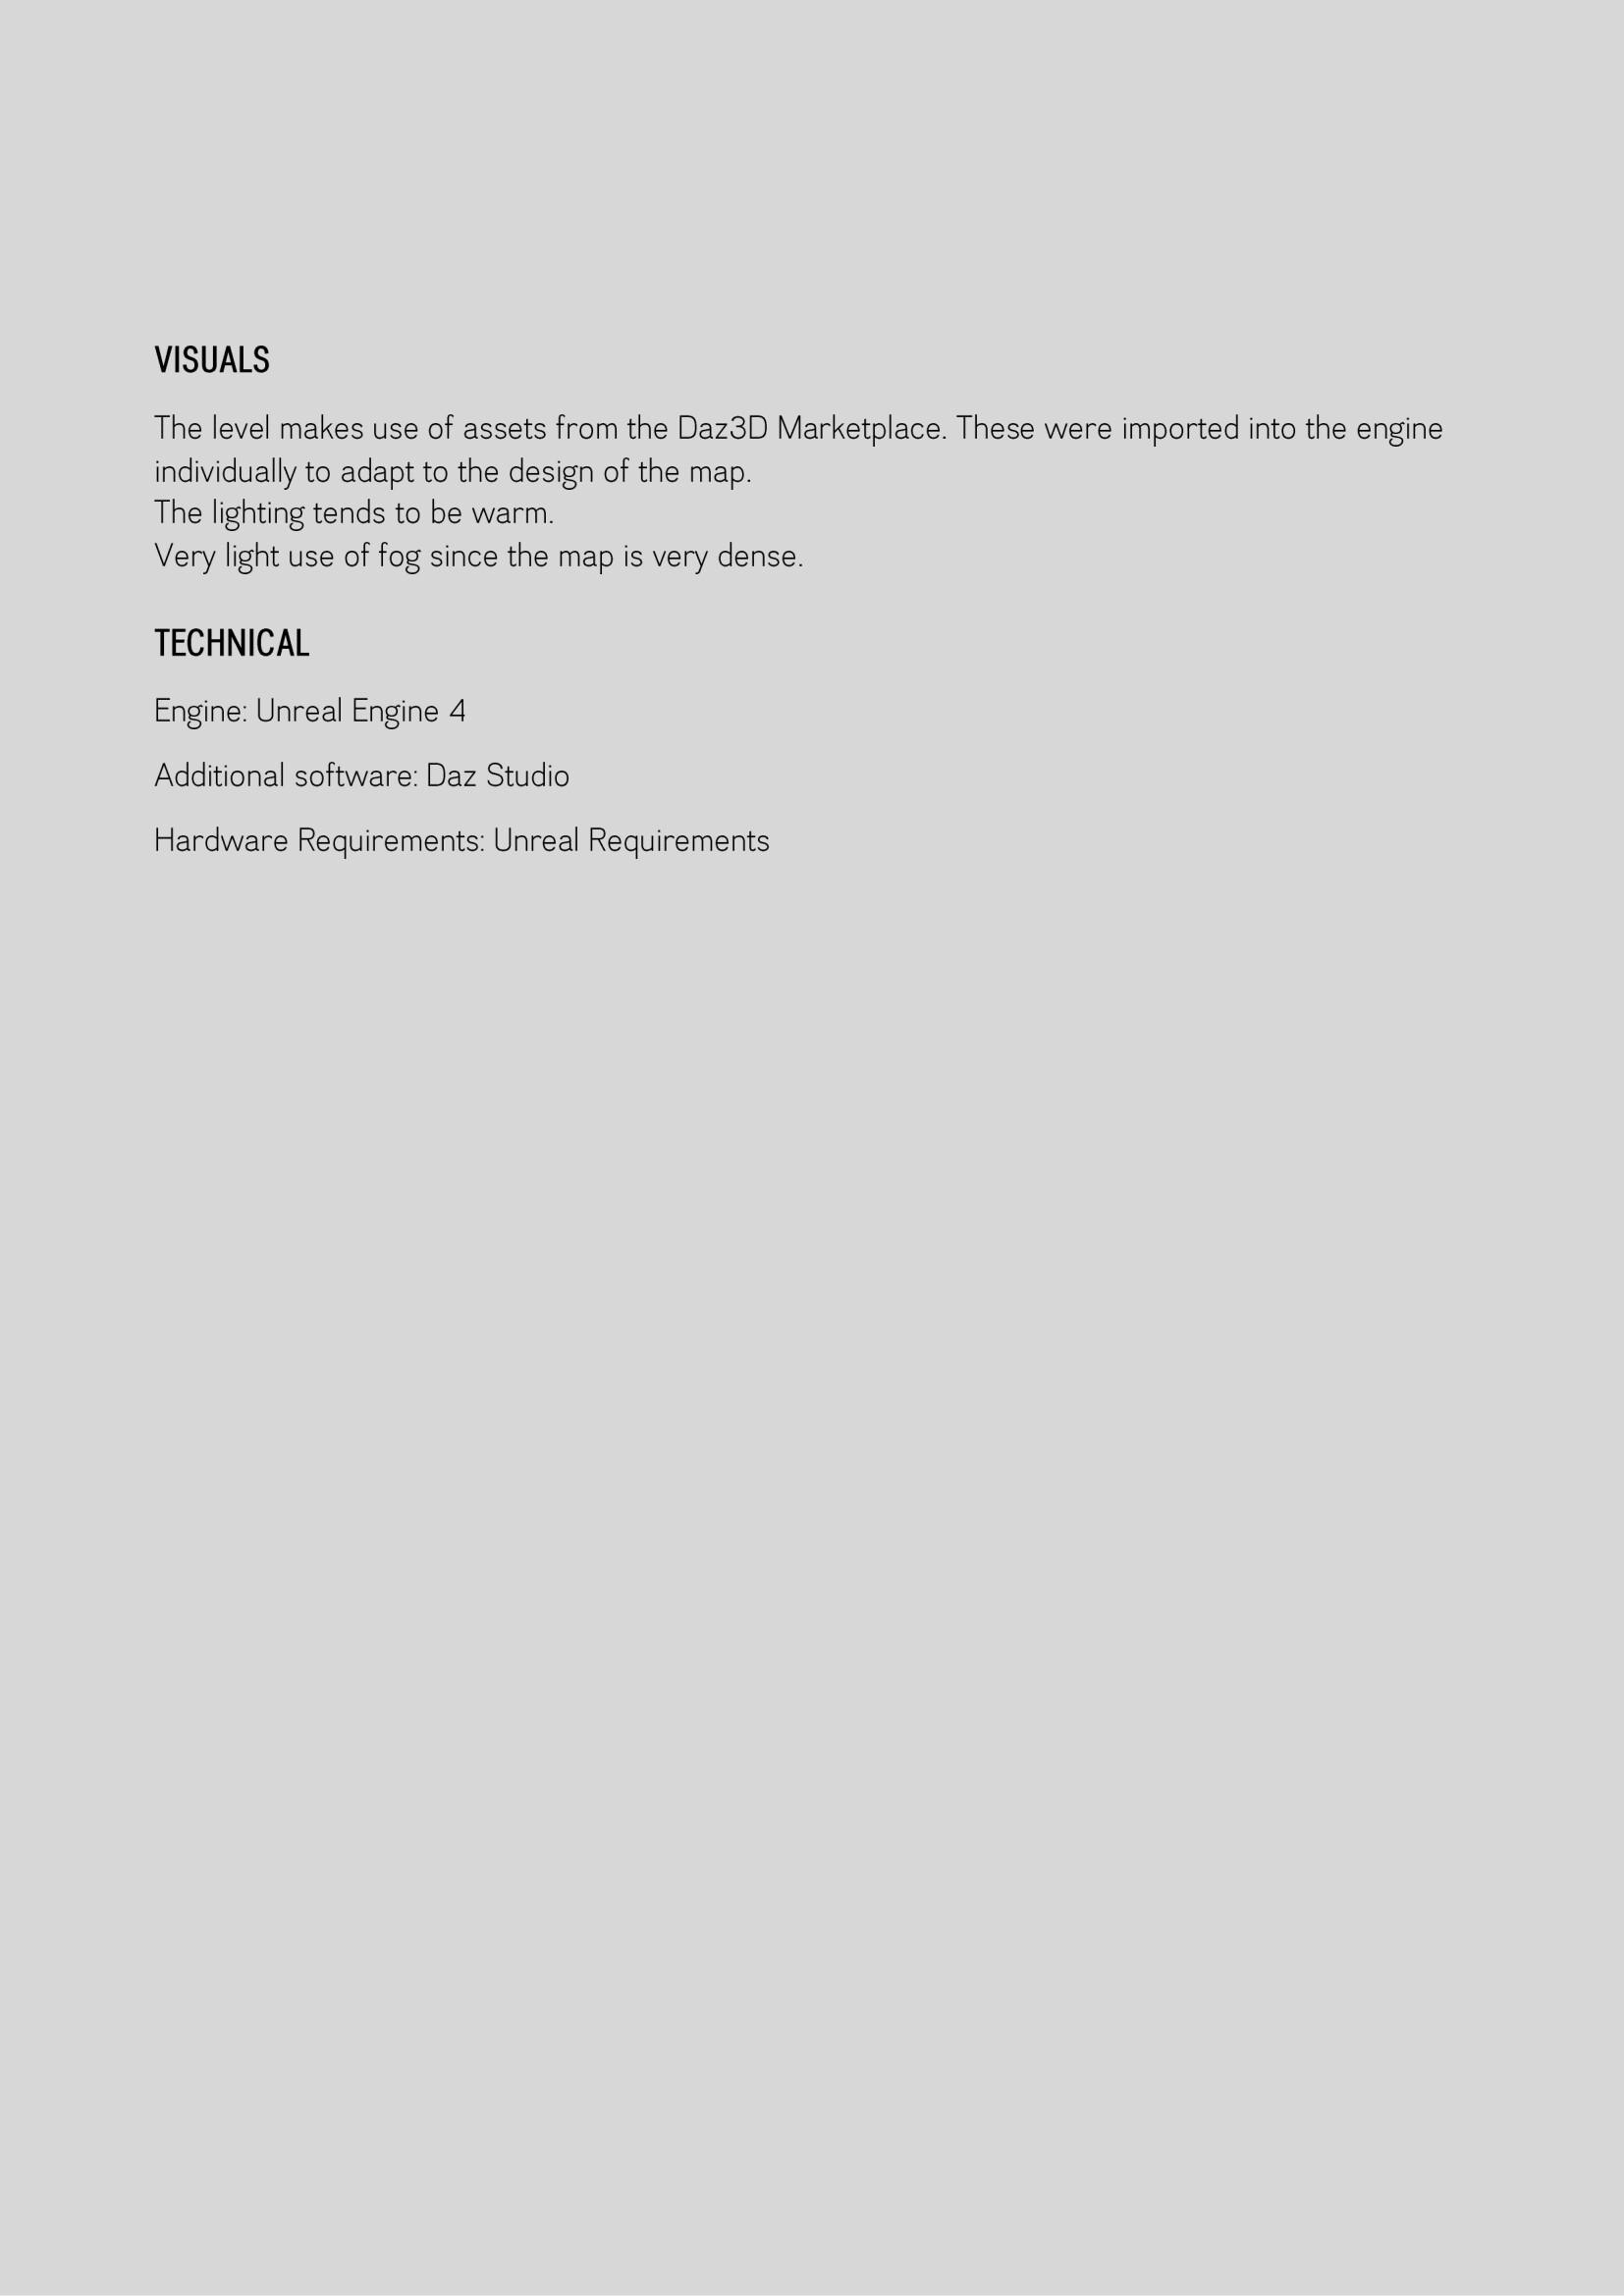 ArtStation - VENICE - Unreal Engine 4, Jacopo Colangelo